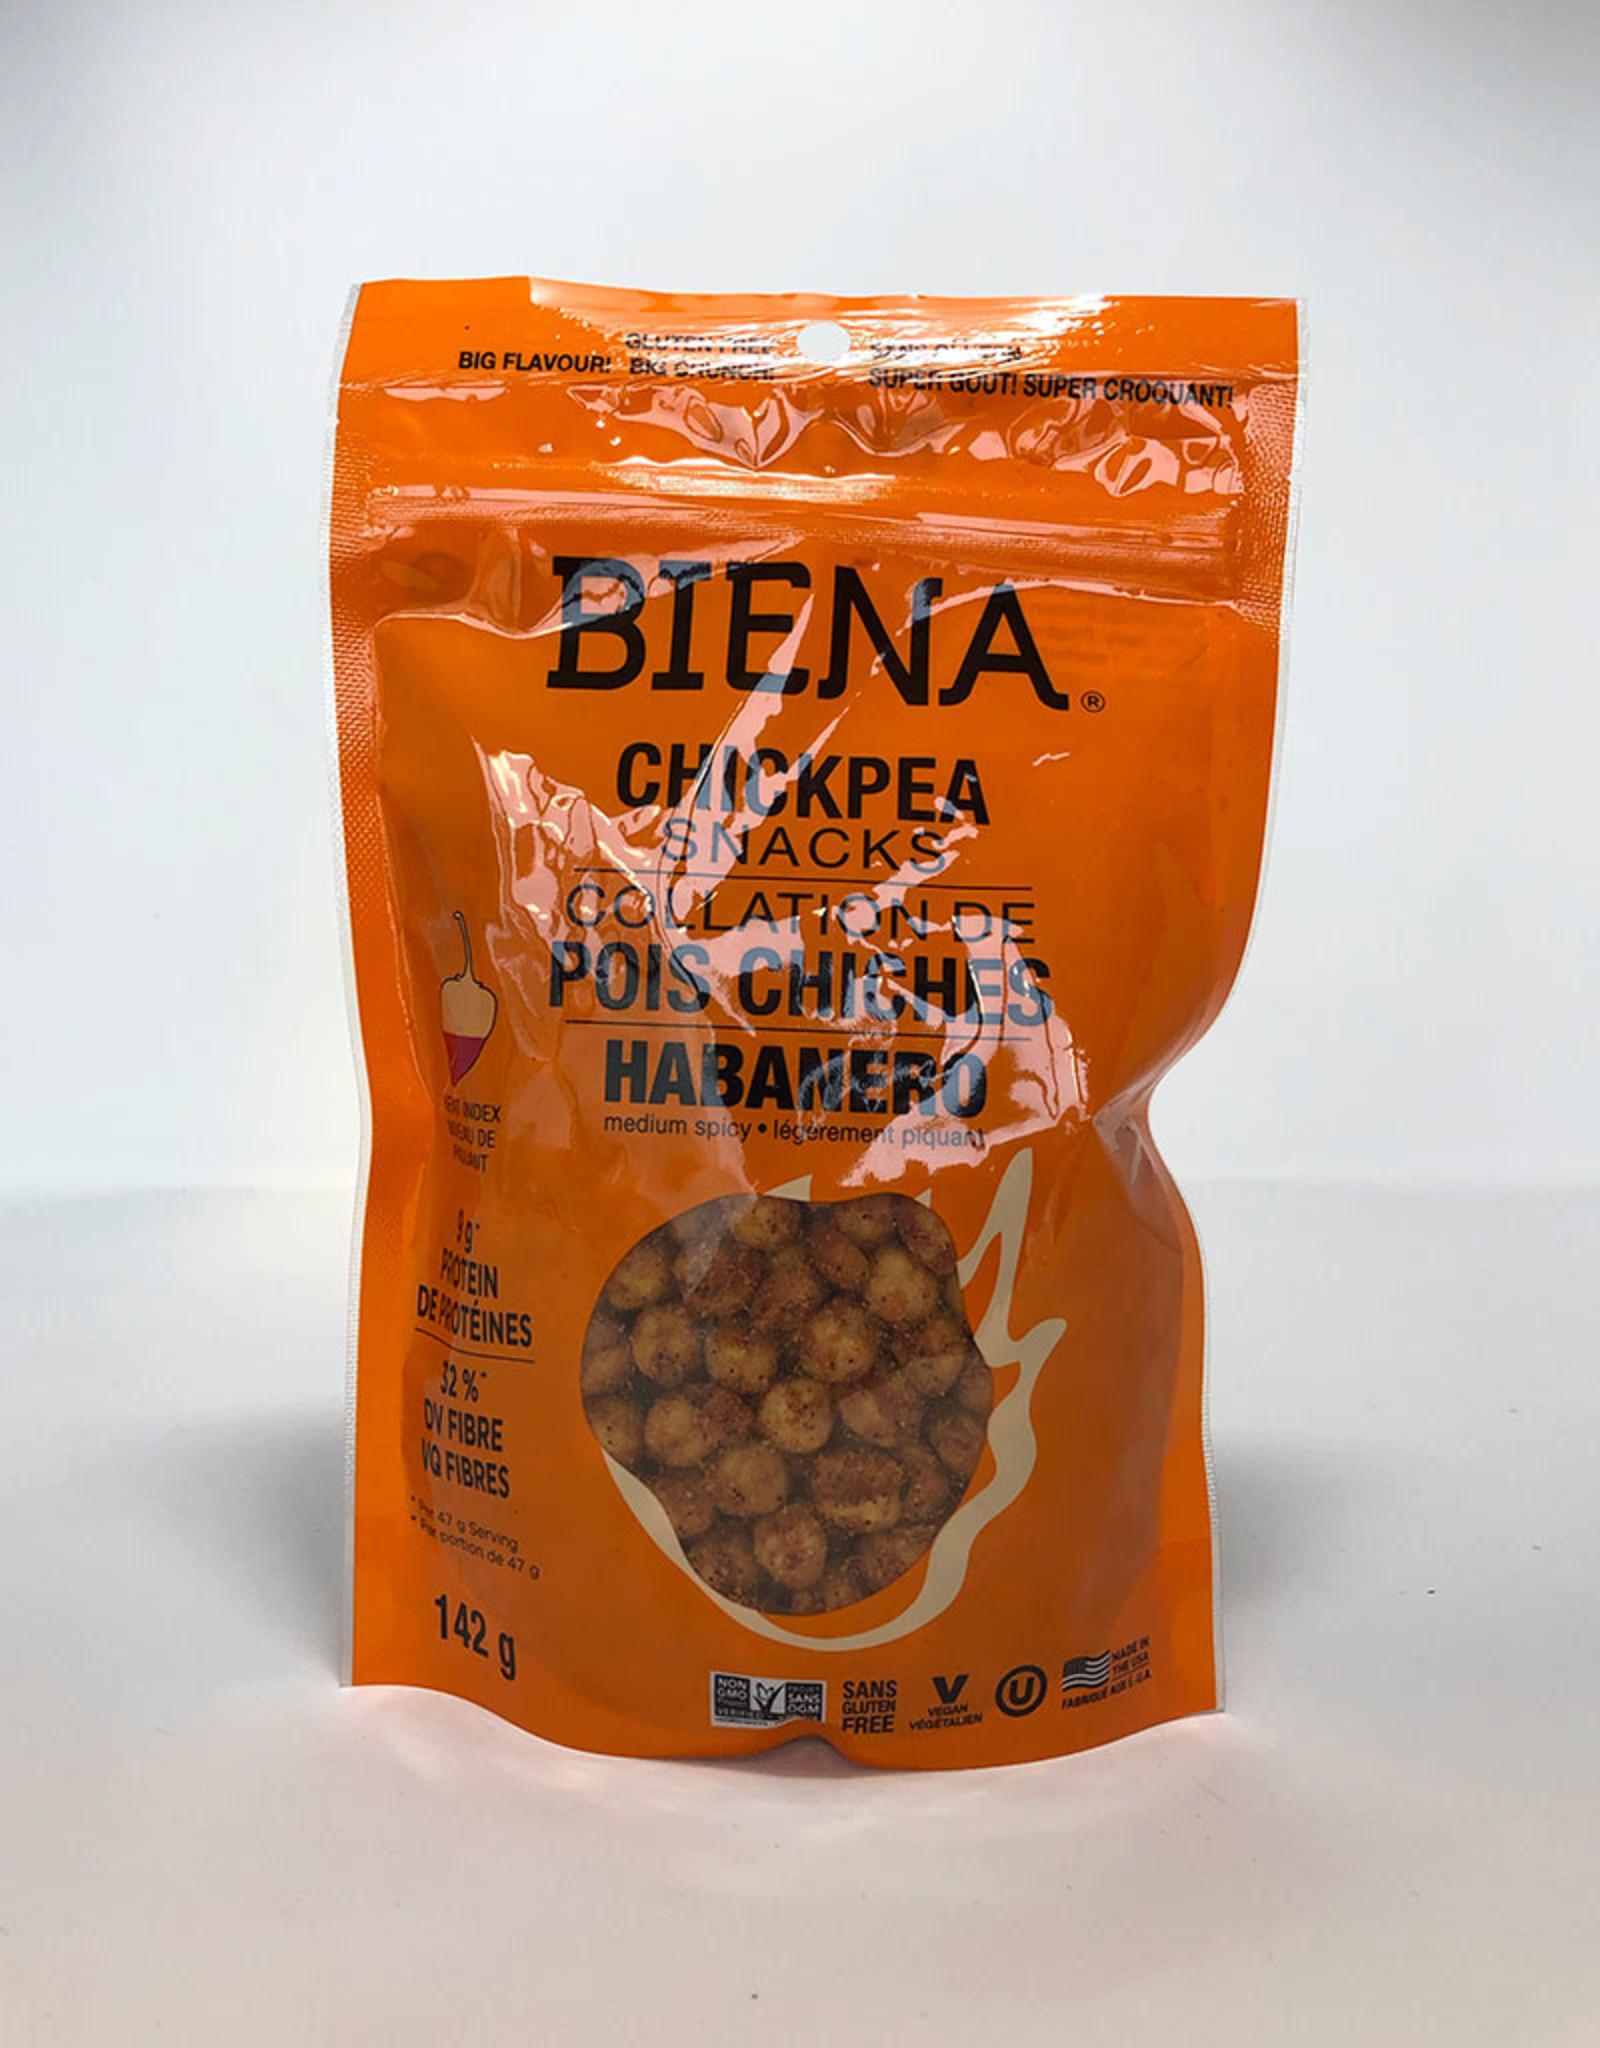 Biena Snacks Biena - Chickpea Snacks, Habanero